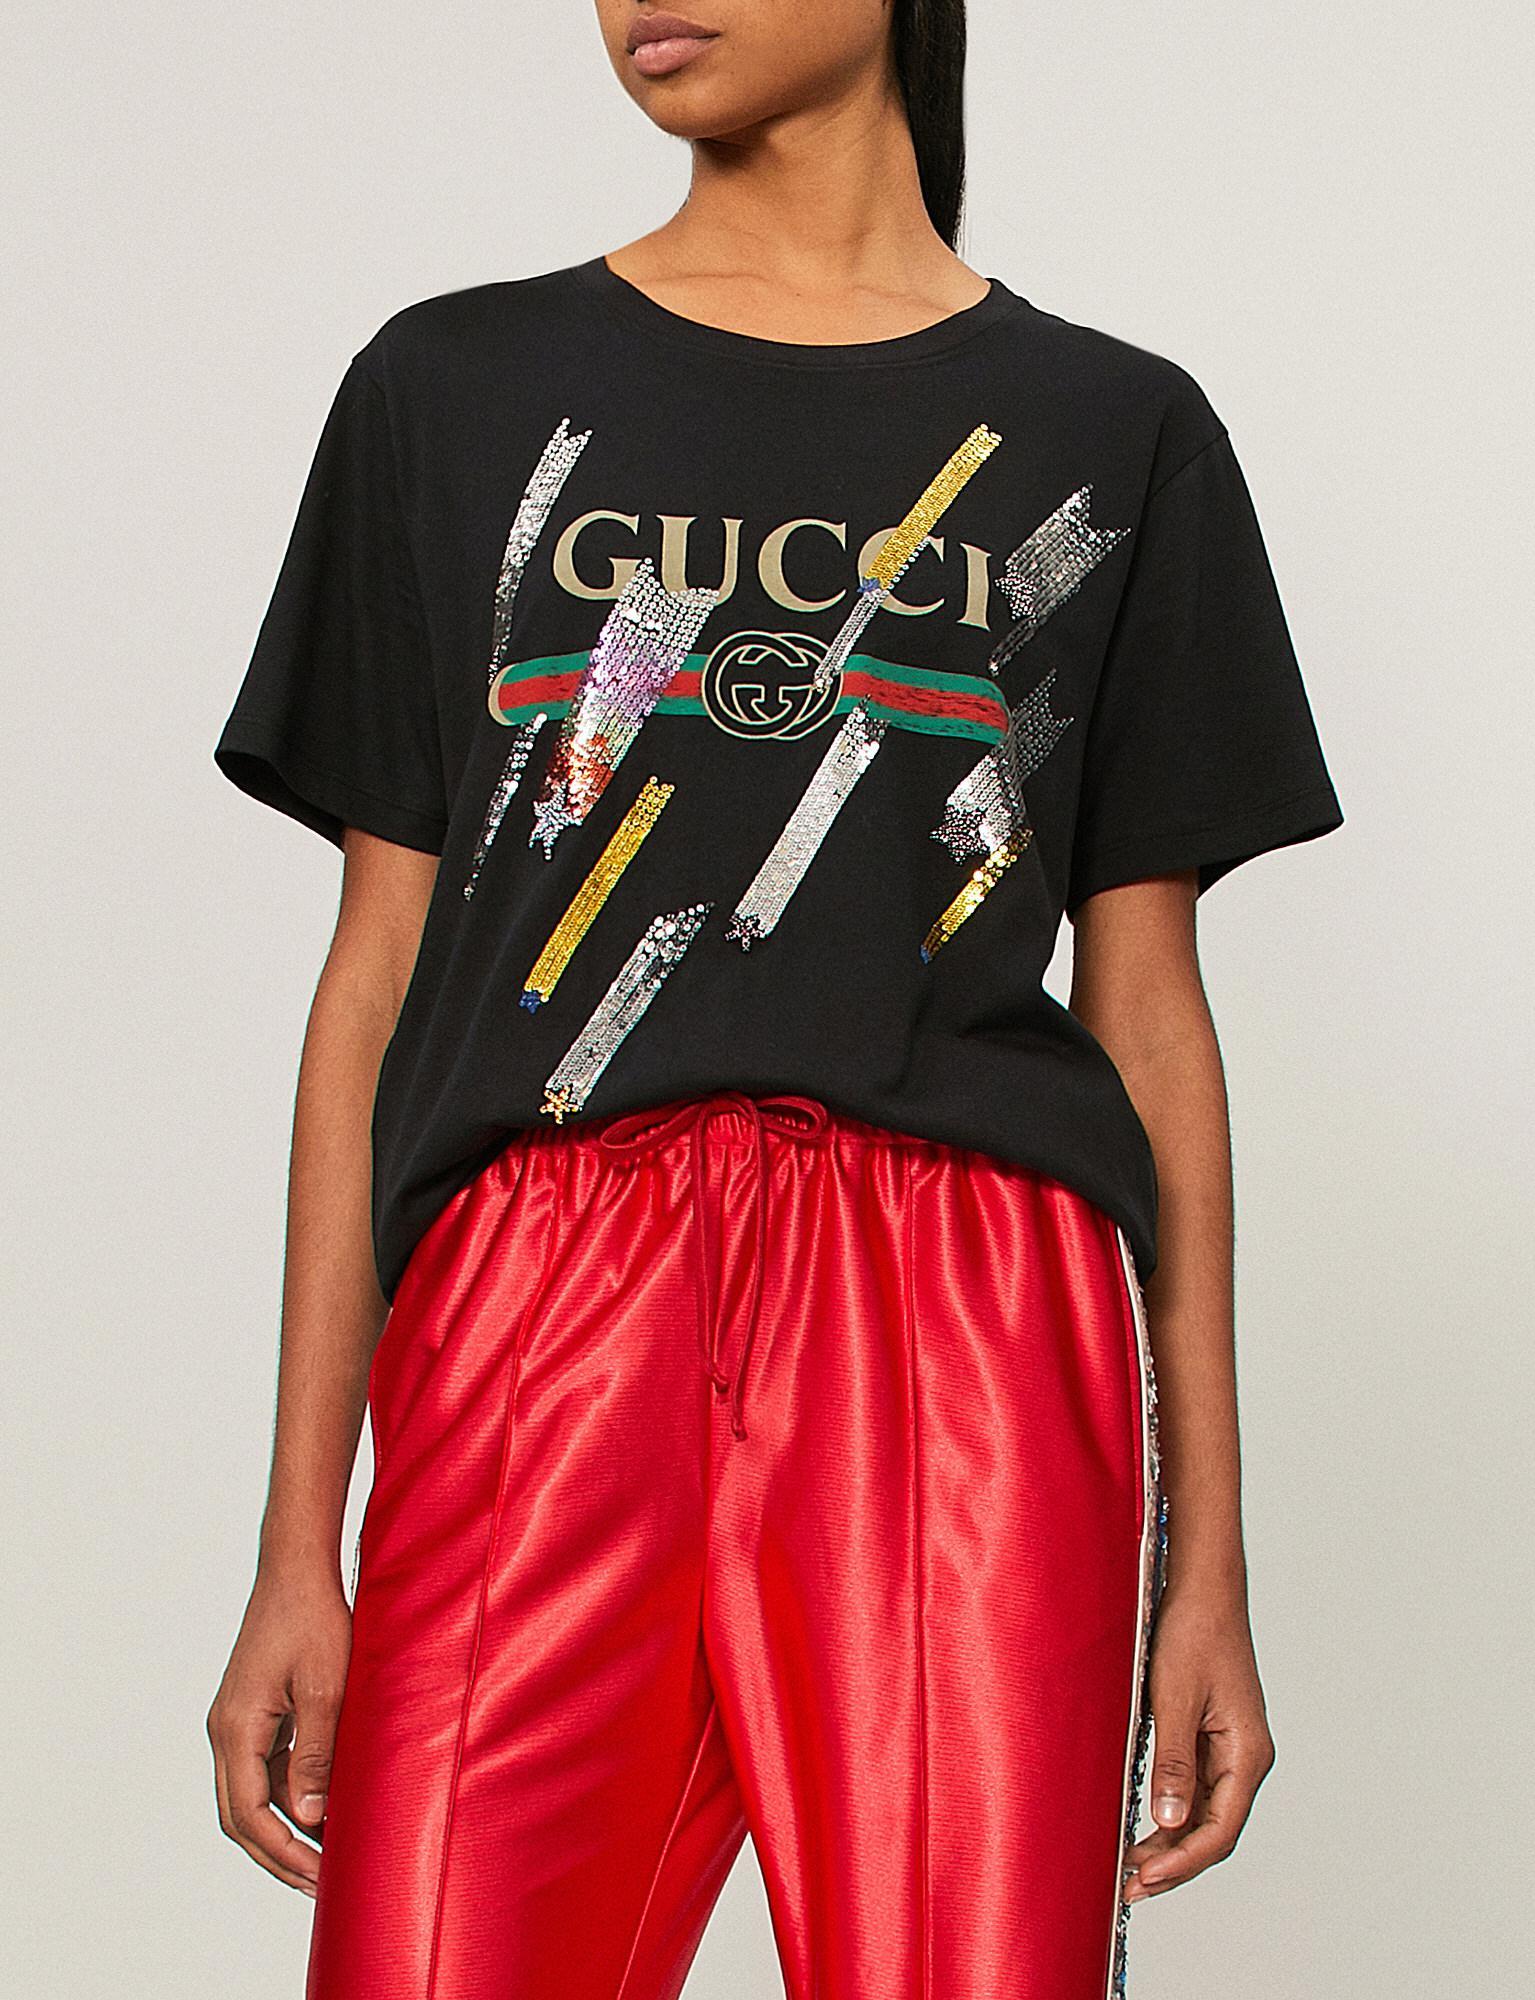 8f6ba14a2b37 Gucci Logo Shooting Stars Embellished Cotton-jersey T-shirt in Black ...